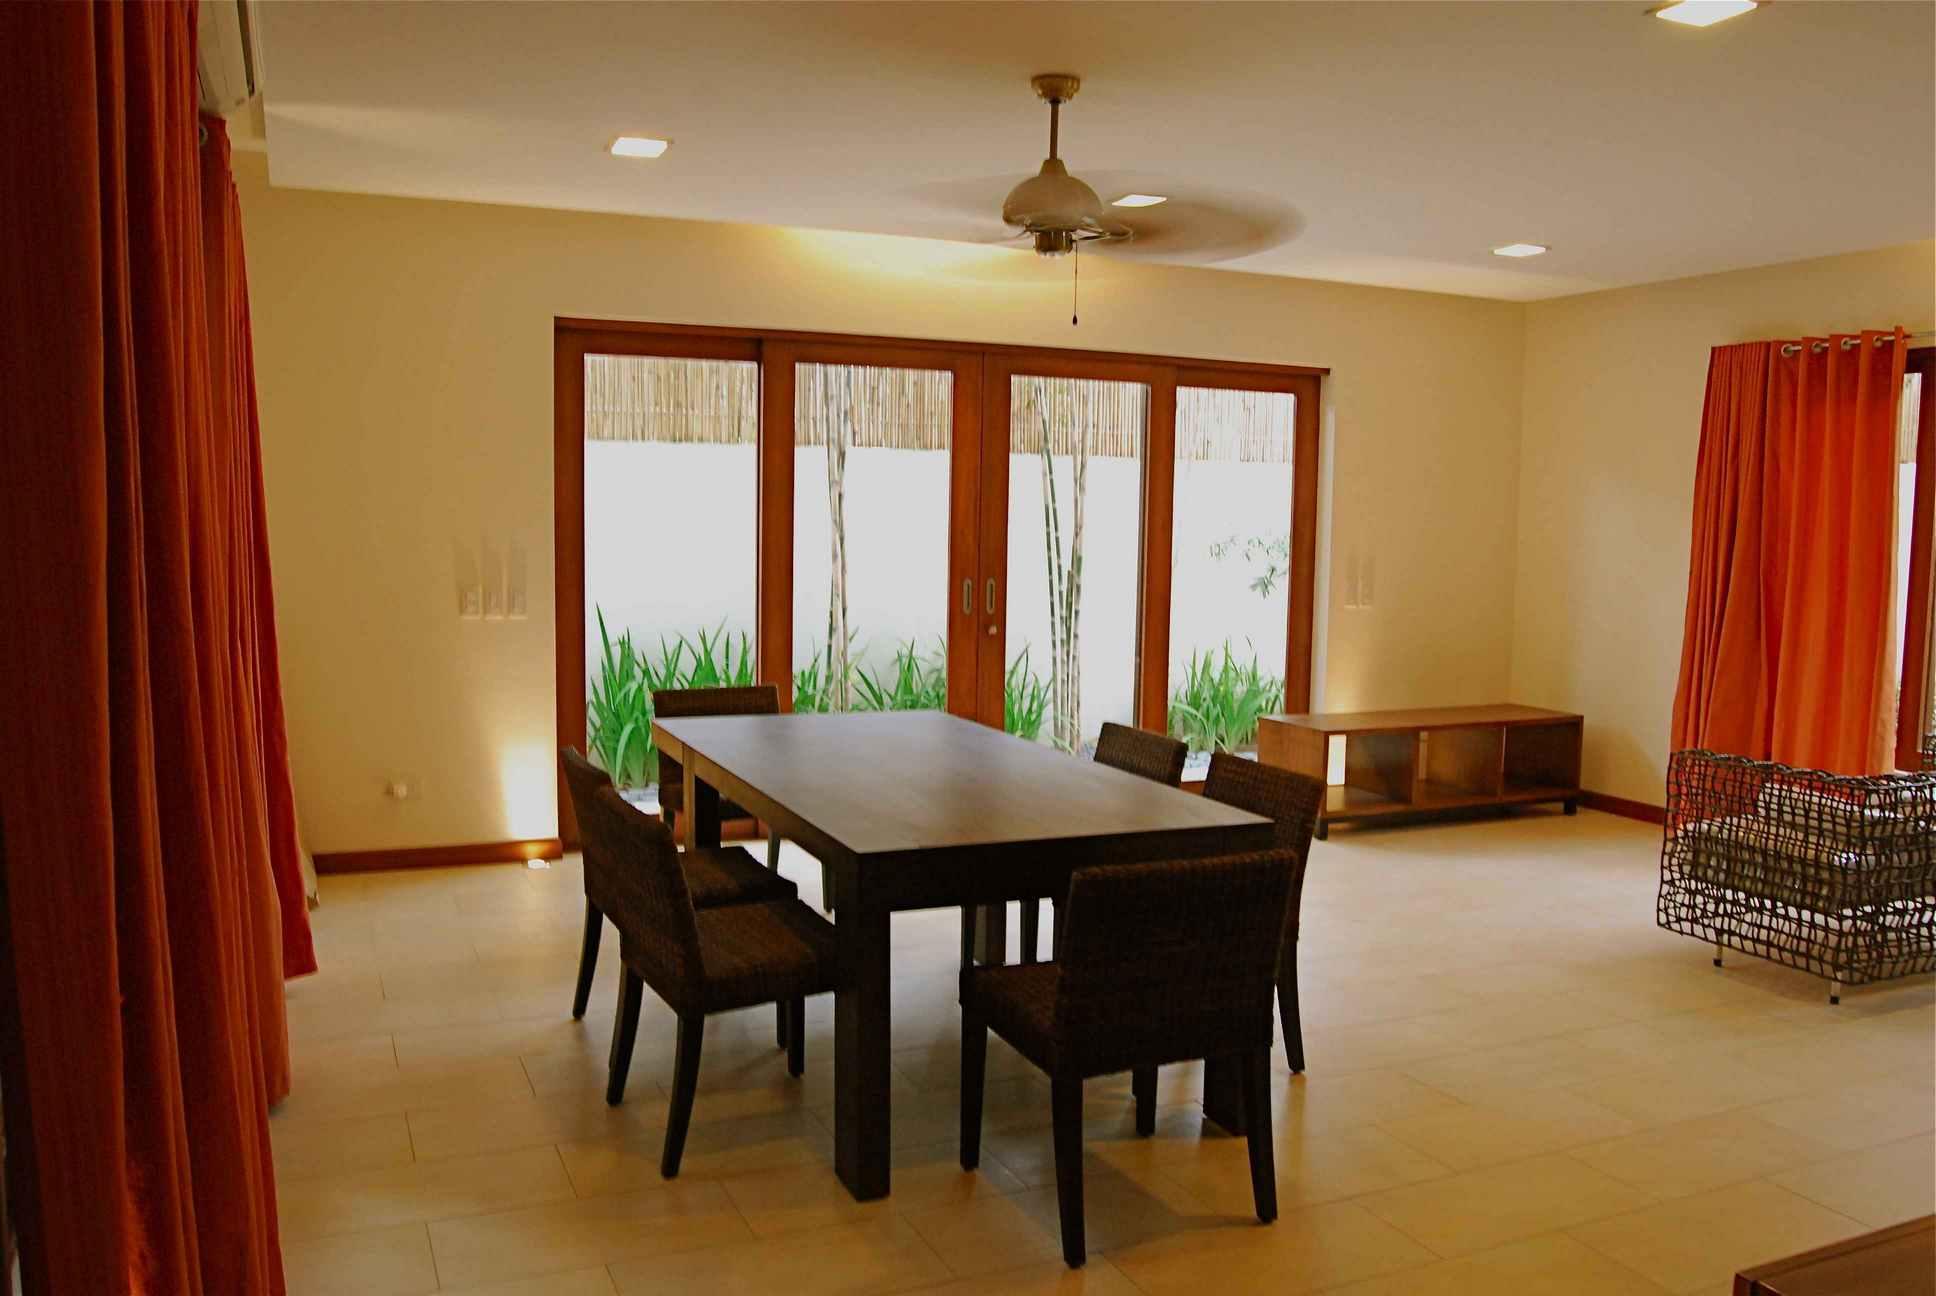 RH162 3 Bedroom House for Rent in Cebu City Banilad Cebu Grand Realty   2. House for Rent in Cebu City Banilad   Cebu Grand Realty